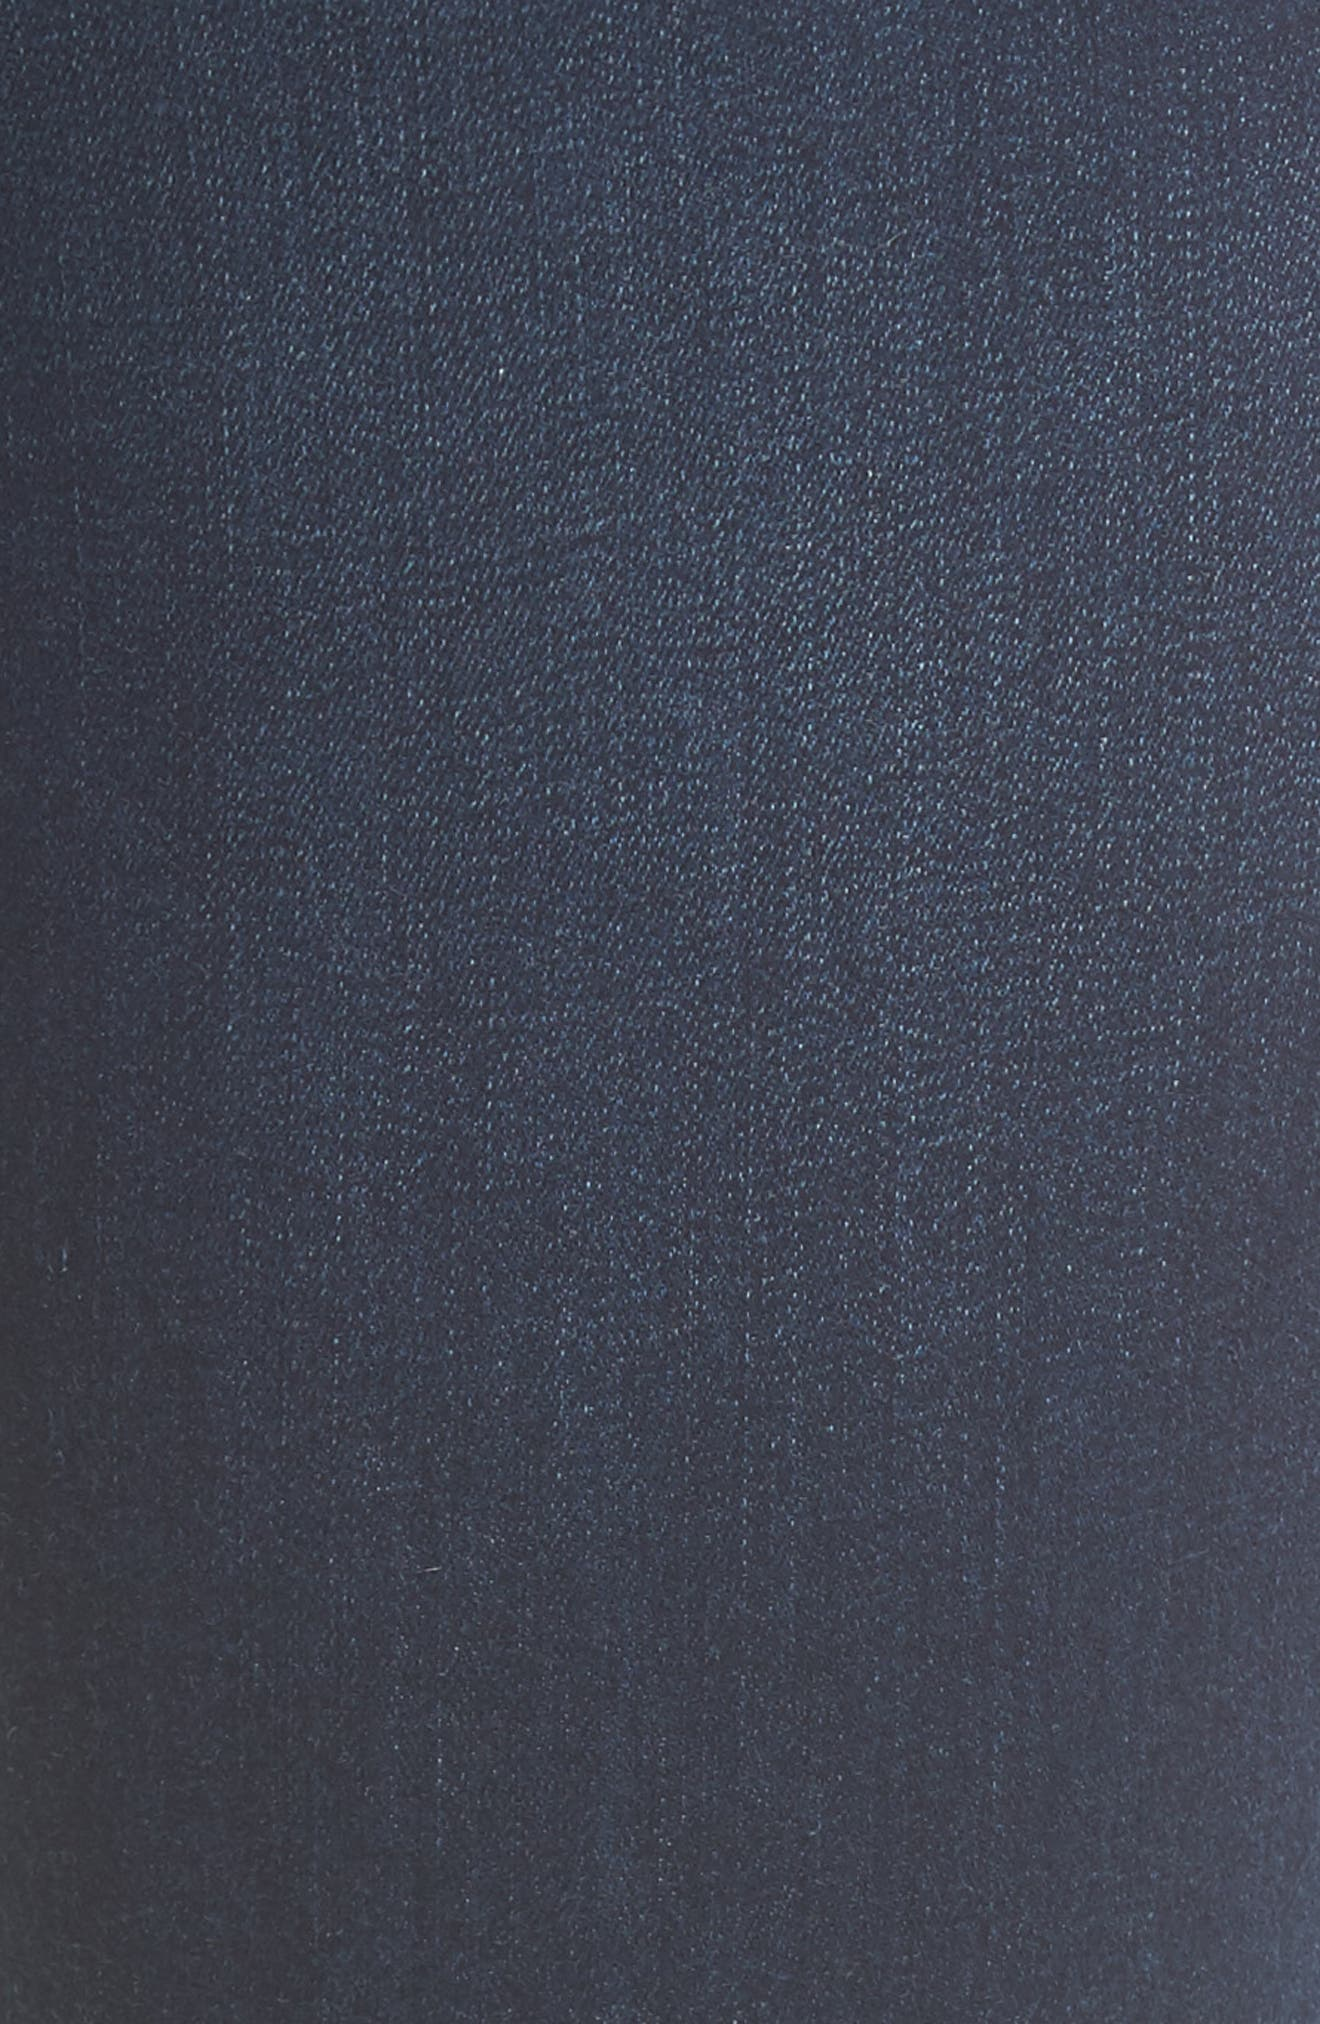 Itty Bitty Split Hem Bootcut Jeans,                             Alternate thumbnail 5, color,